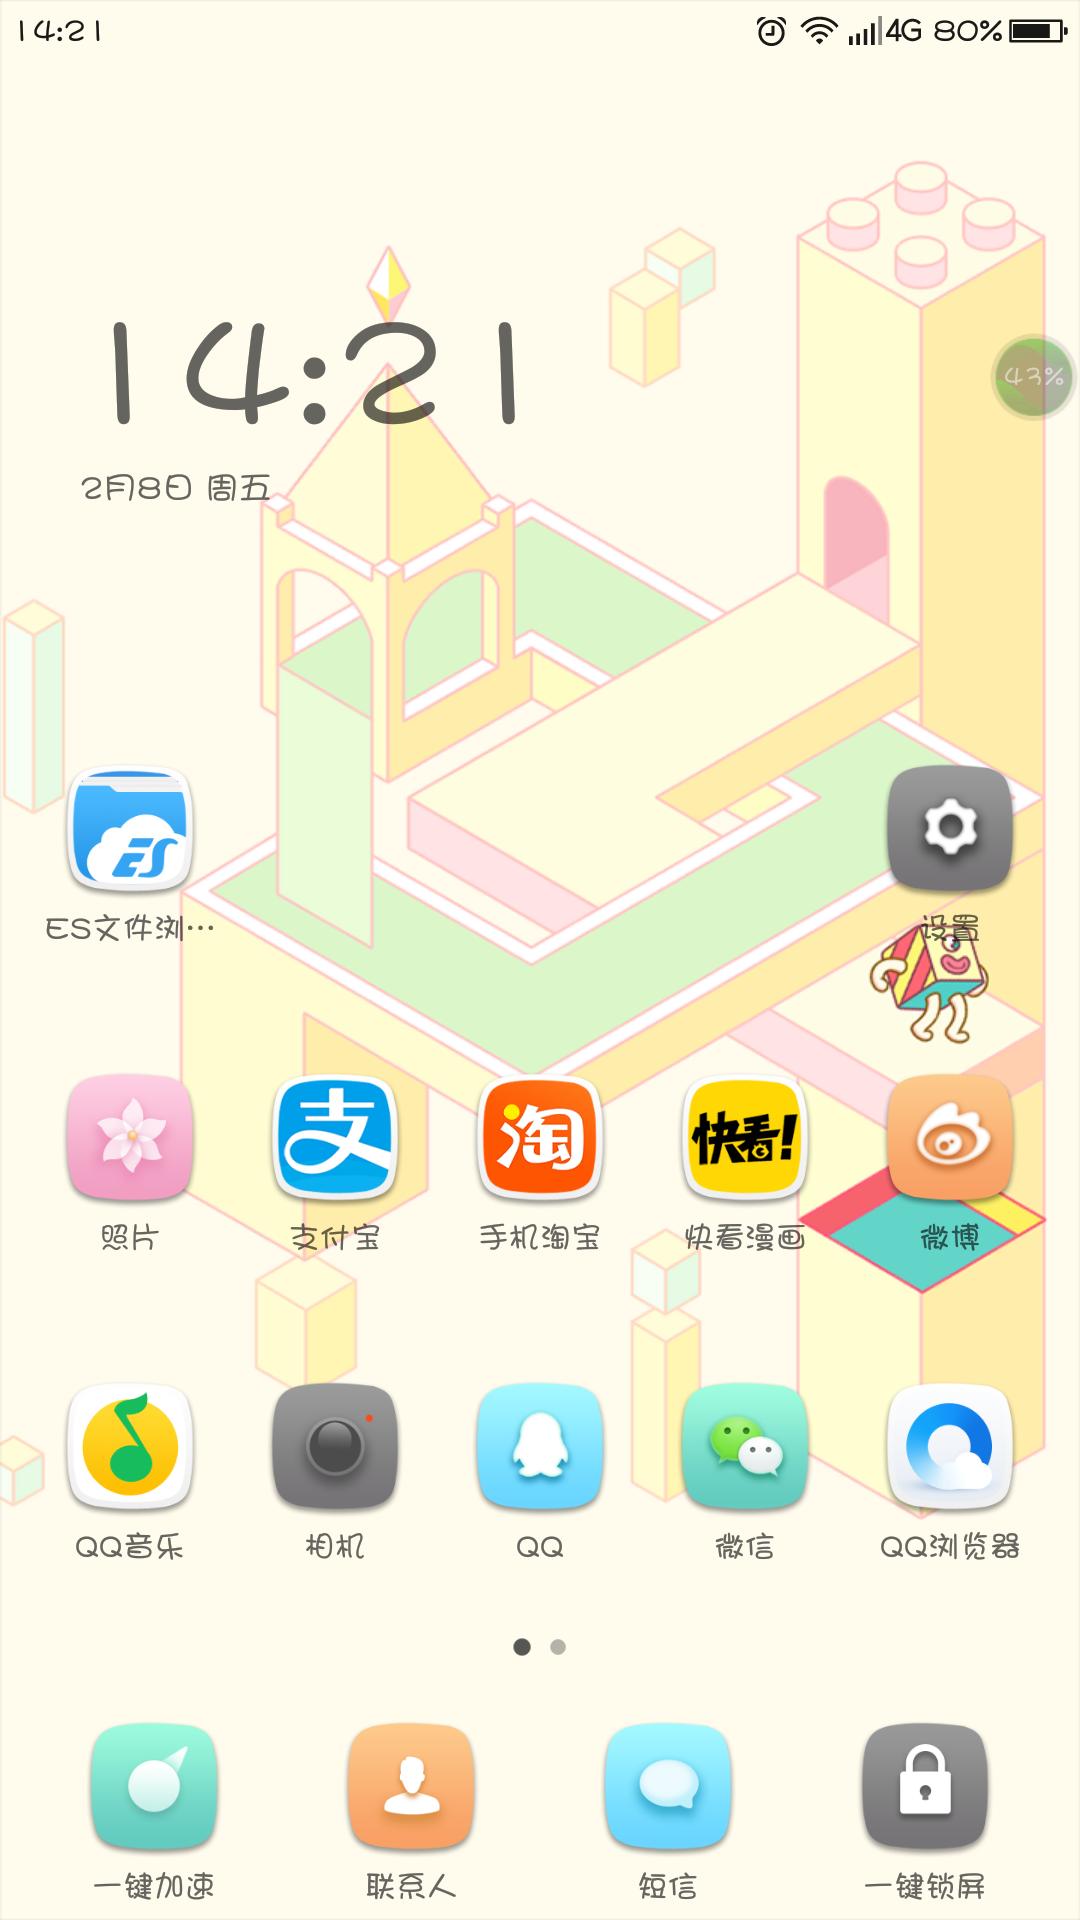 Screenshot_2019-02-08-14-21-57.png